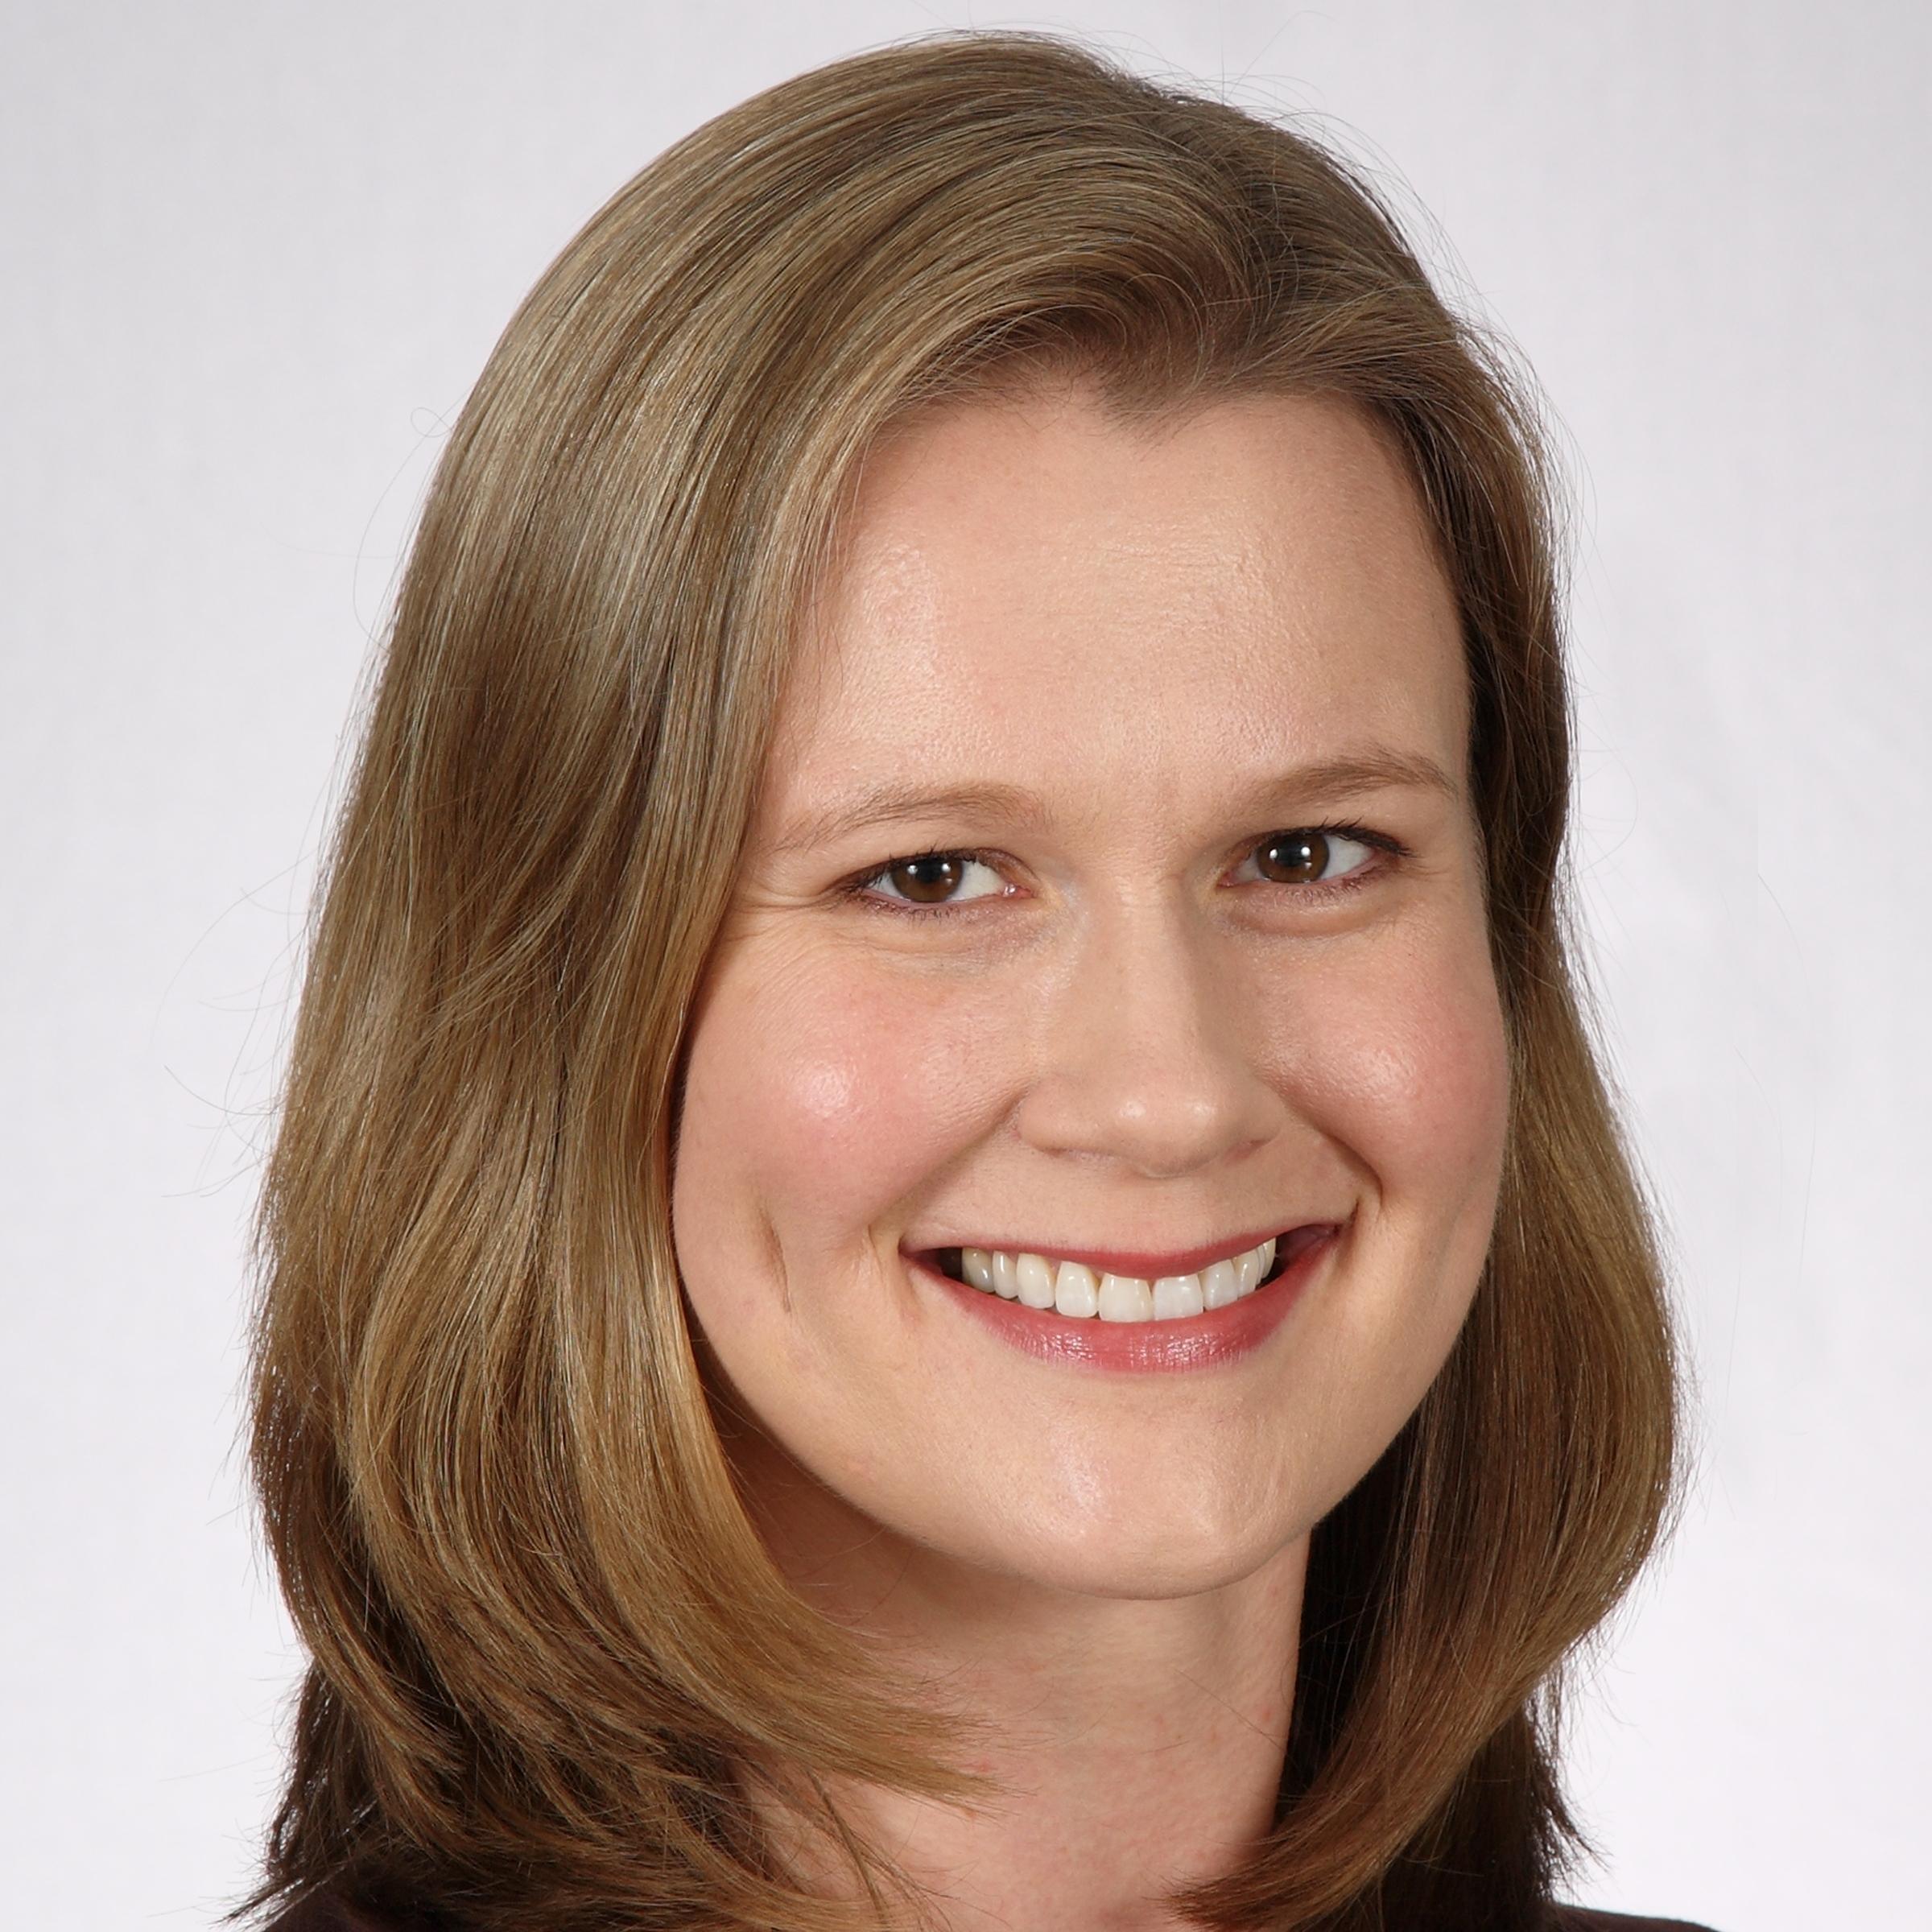 Maija Salins, LMT, CST-D of Wise Bodymind CranioSacral Therapy